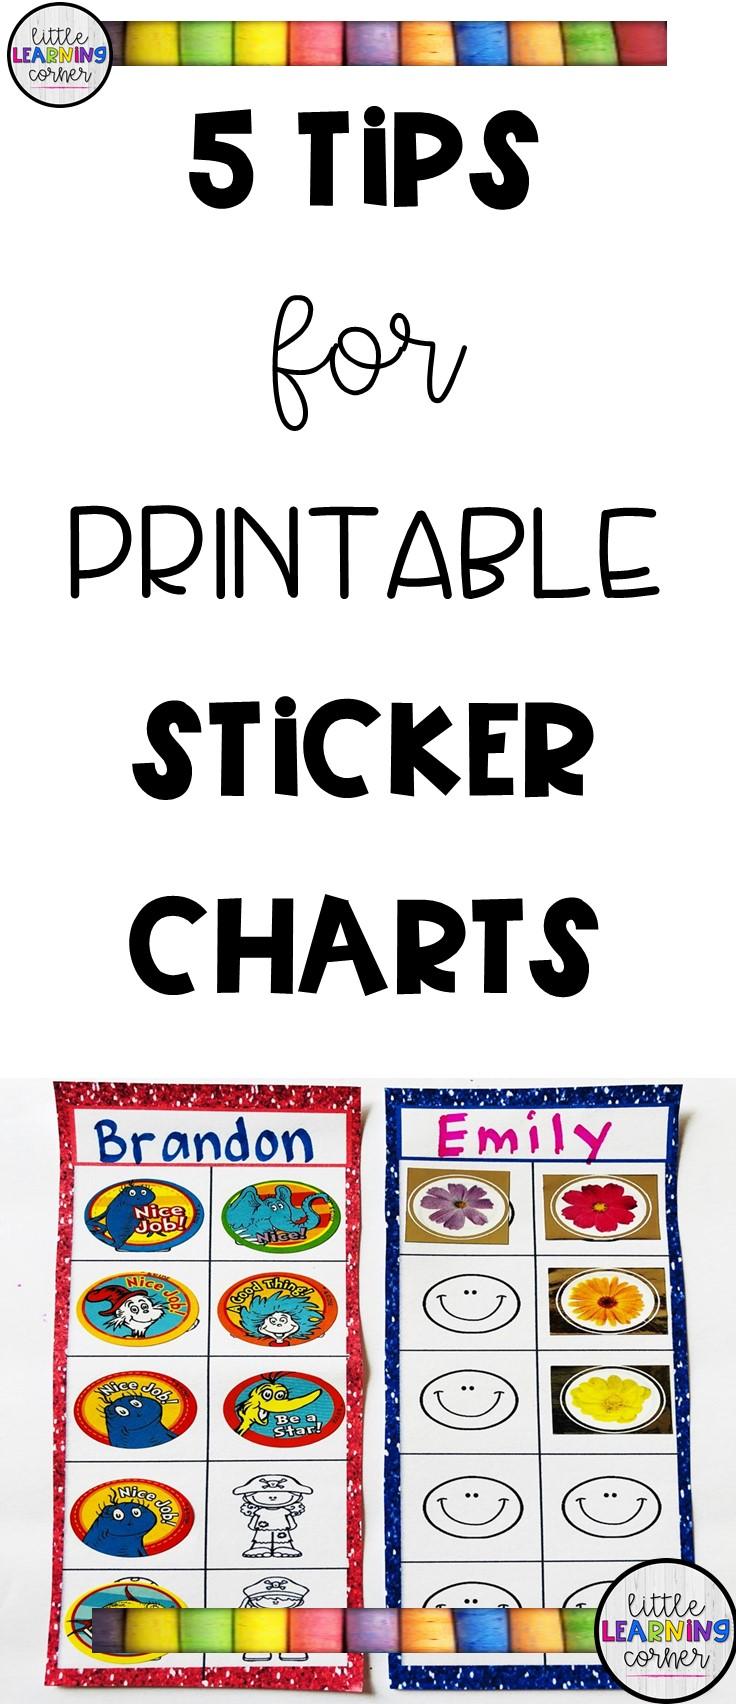 printable-sticker-charts-pin-2